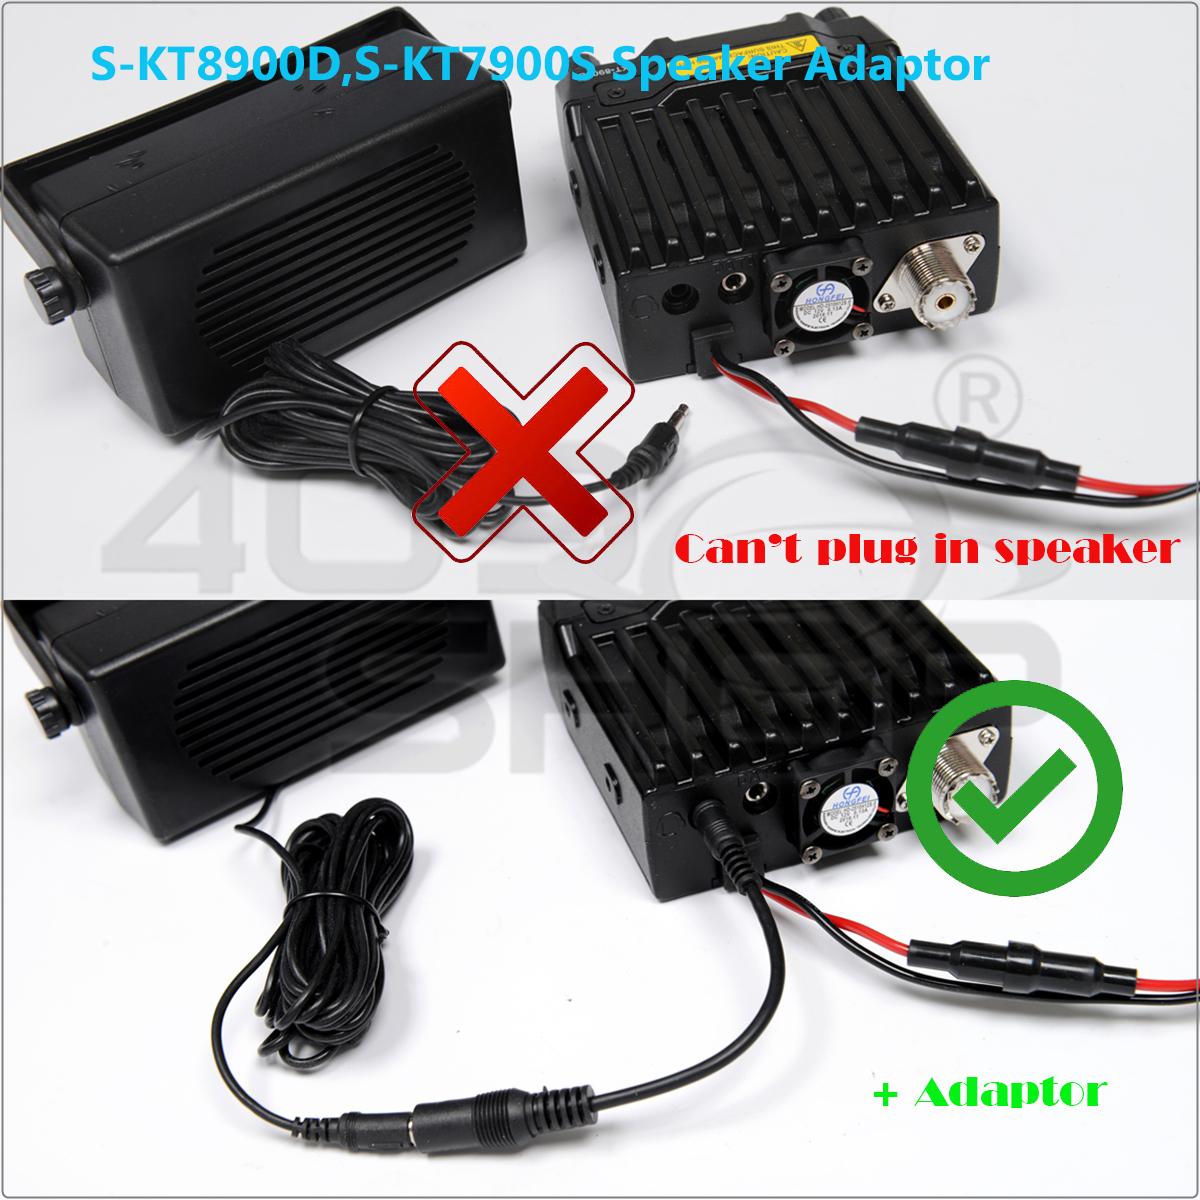 KT-8900D adaptor